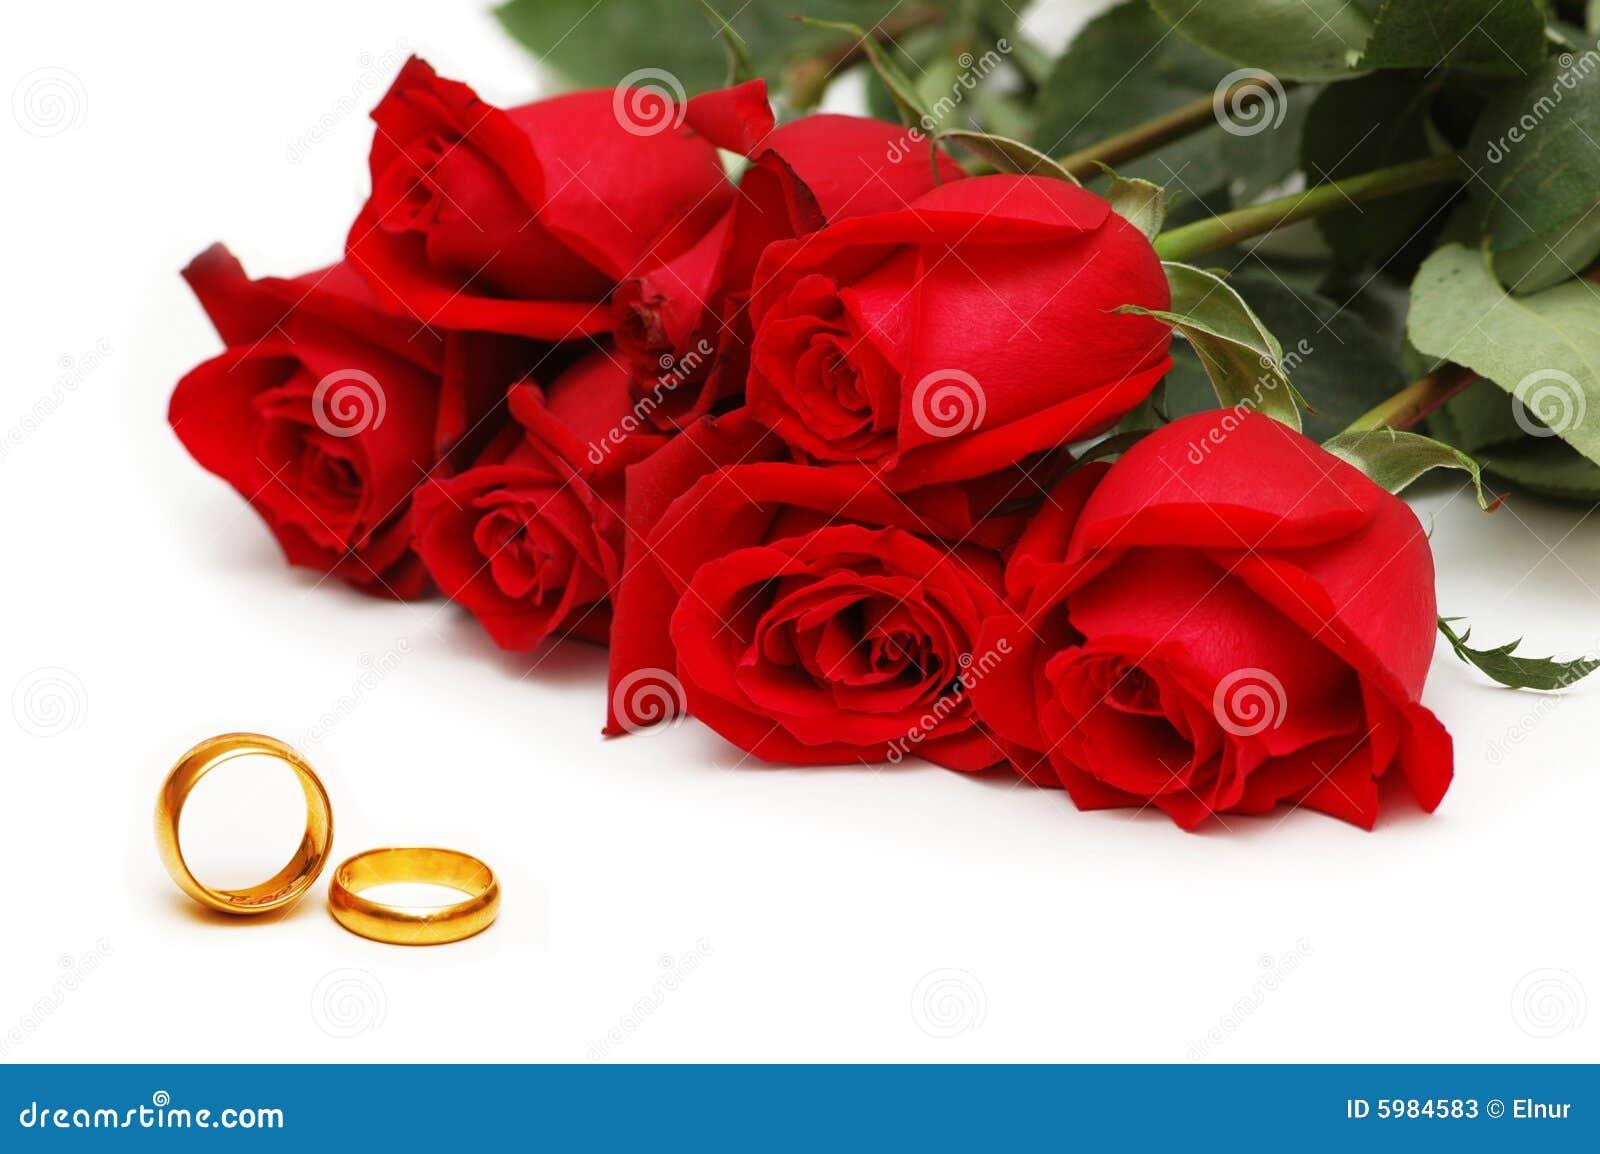 rote rosen und ringe getrennt stockbild bild 5984583. Black Bedroom Furniture Sets. Home Design Ideas